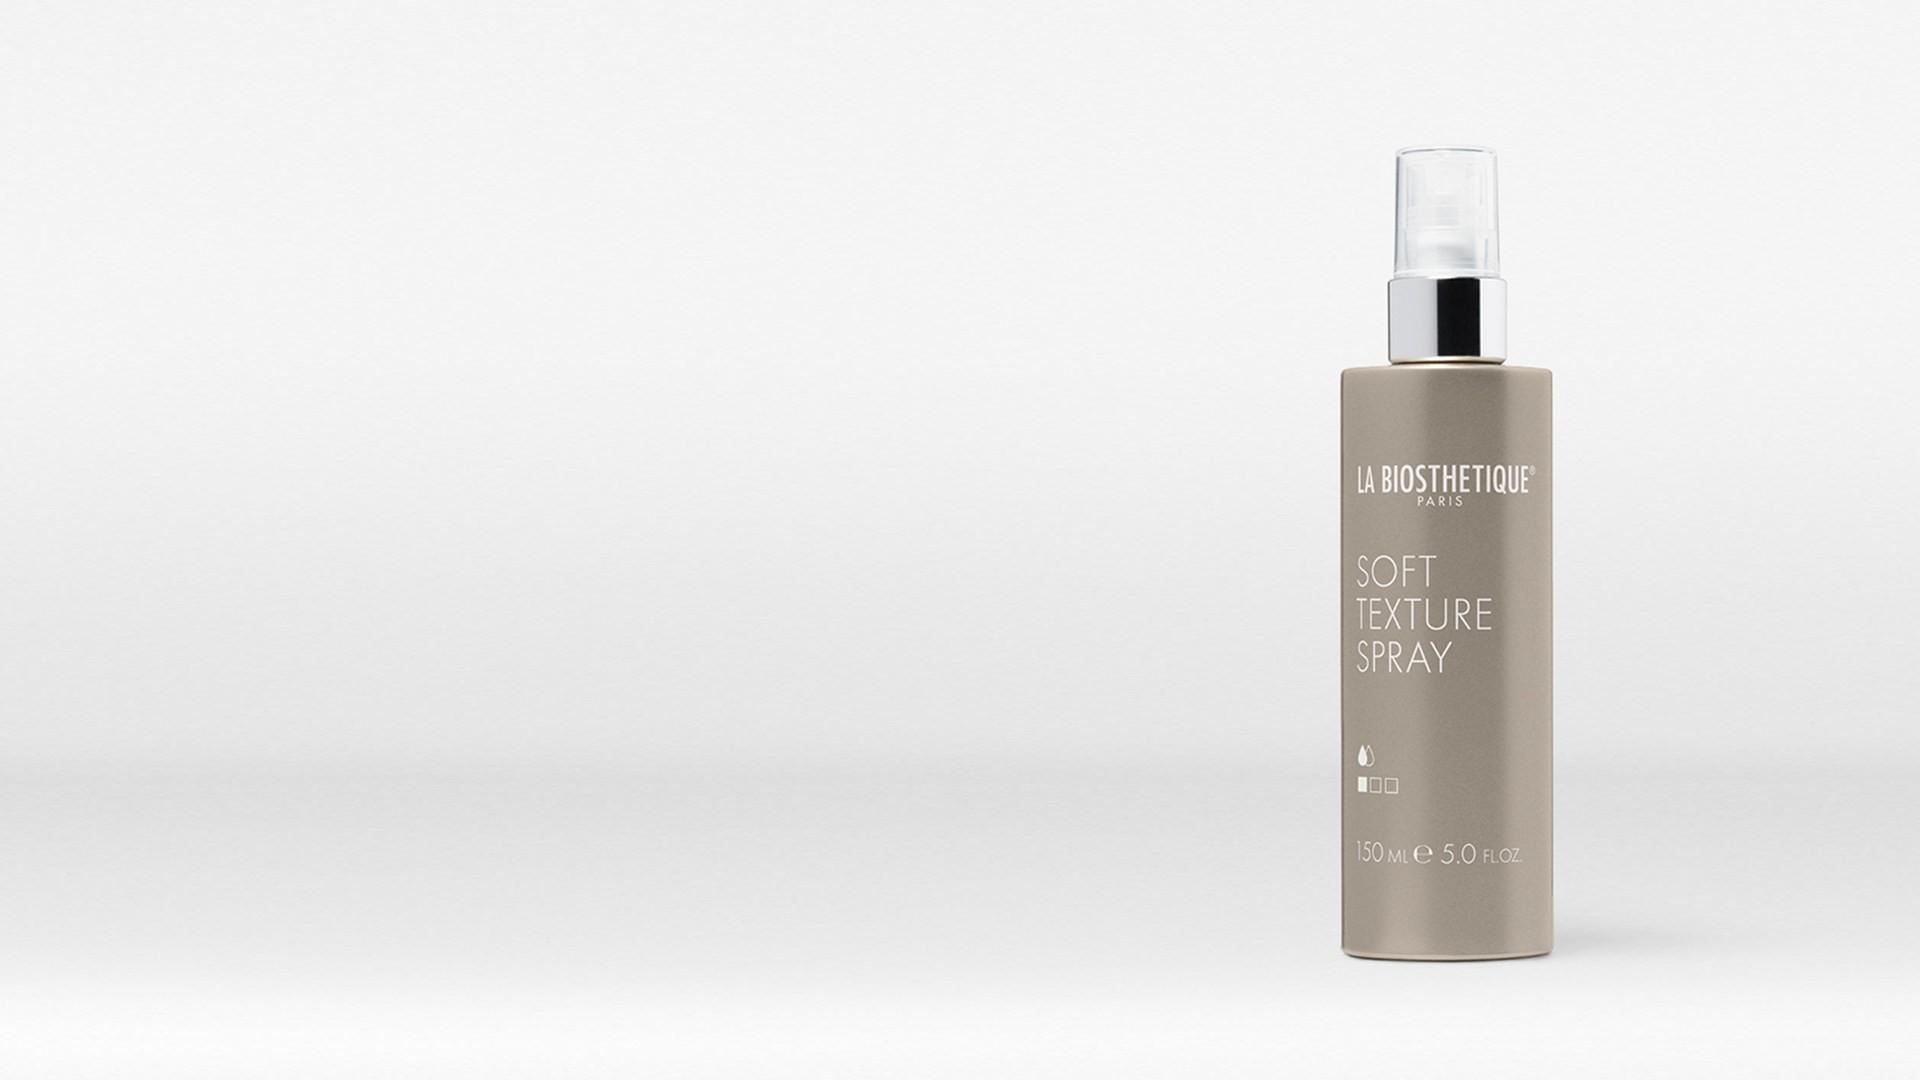 La-Biosthetique-Soft-Texture-Spray-01-Ark